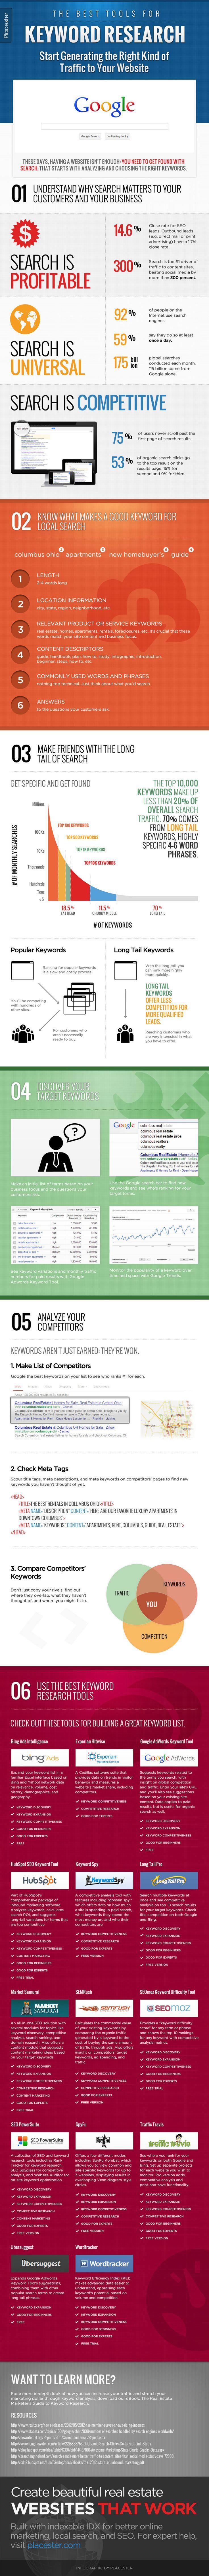 5 Incredible Keyword Research Analysis Tips #Infographics www.socialmediamamma.com